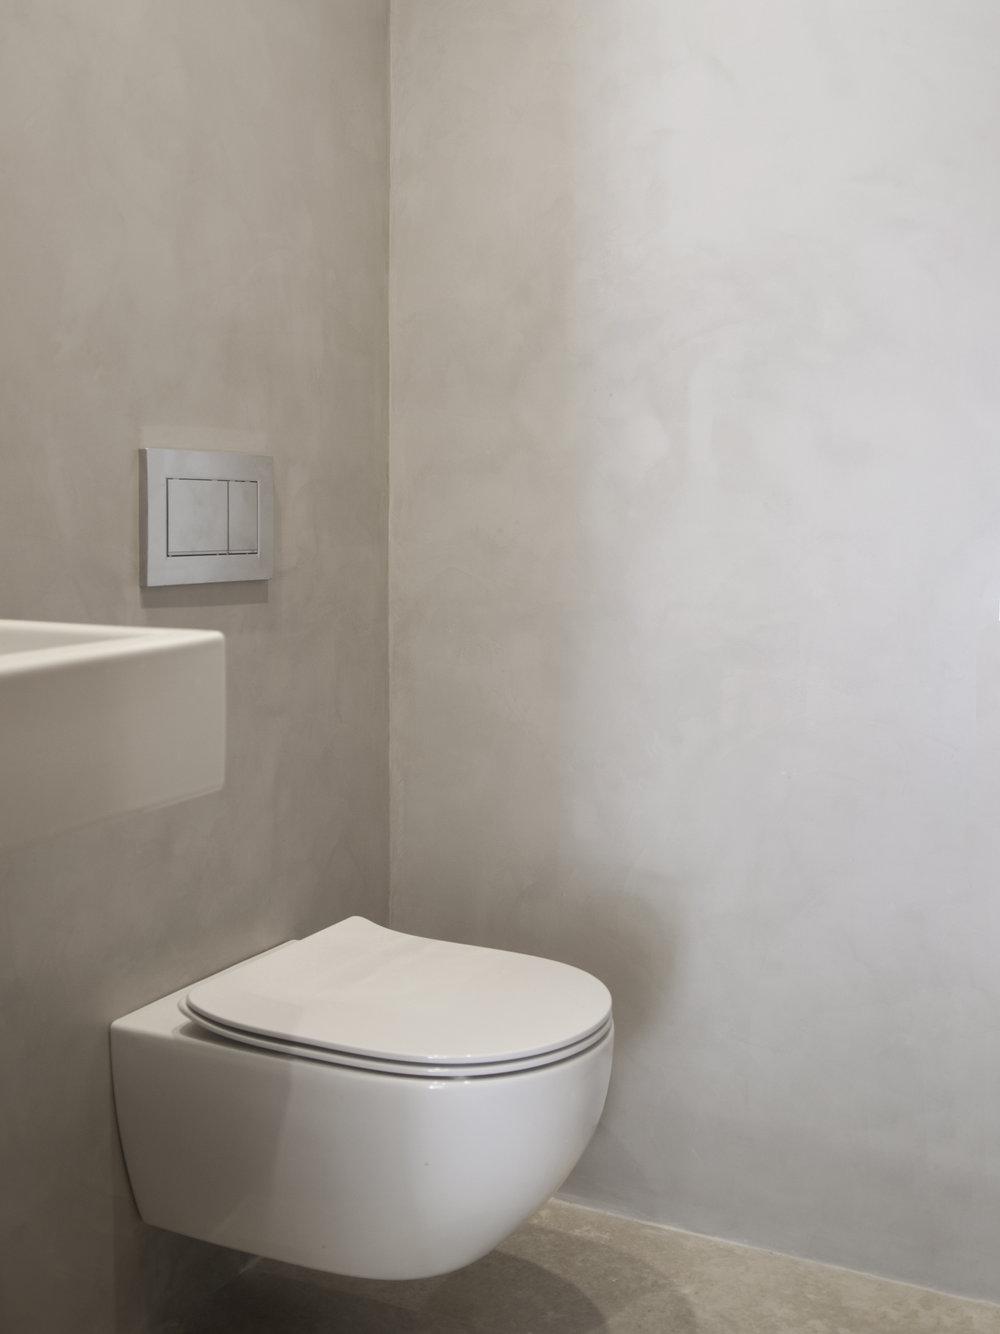 AS_INT_M_toilet groundfloor_3x4_2500px_72DPI.jpg